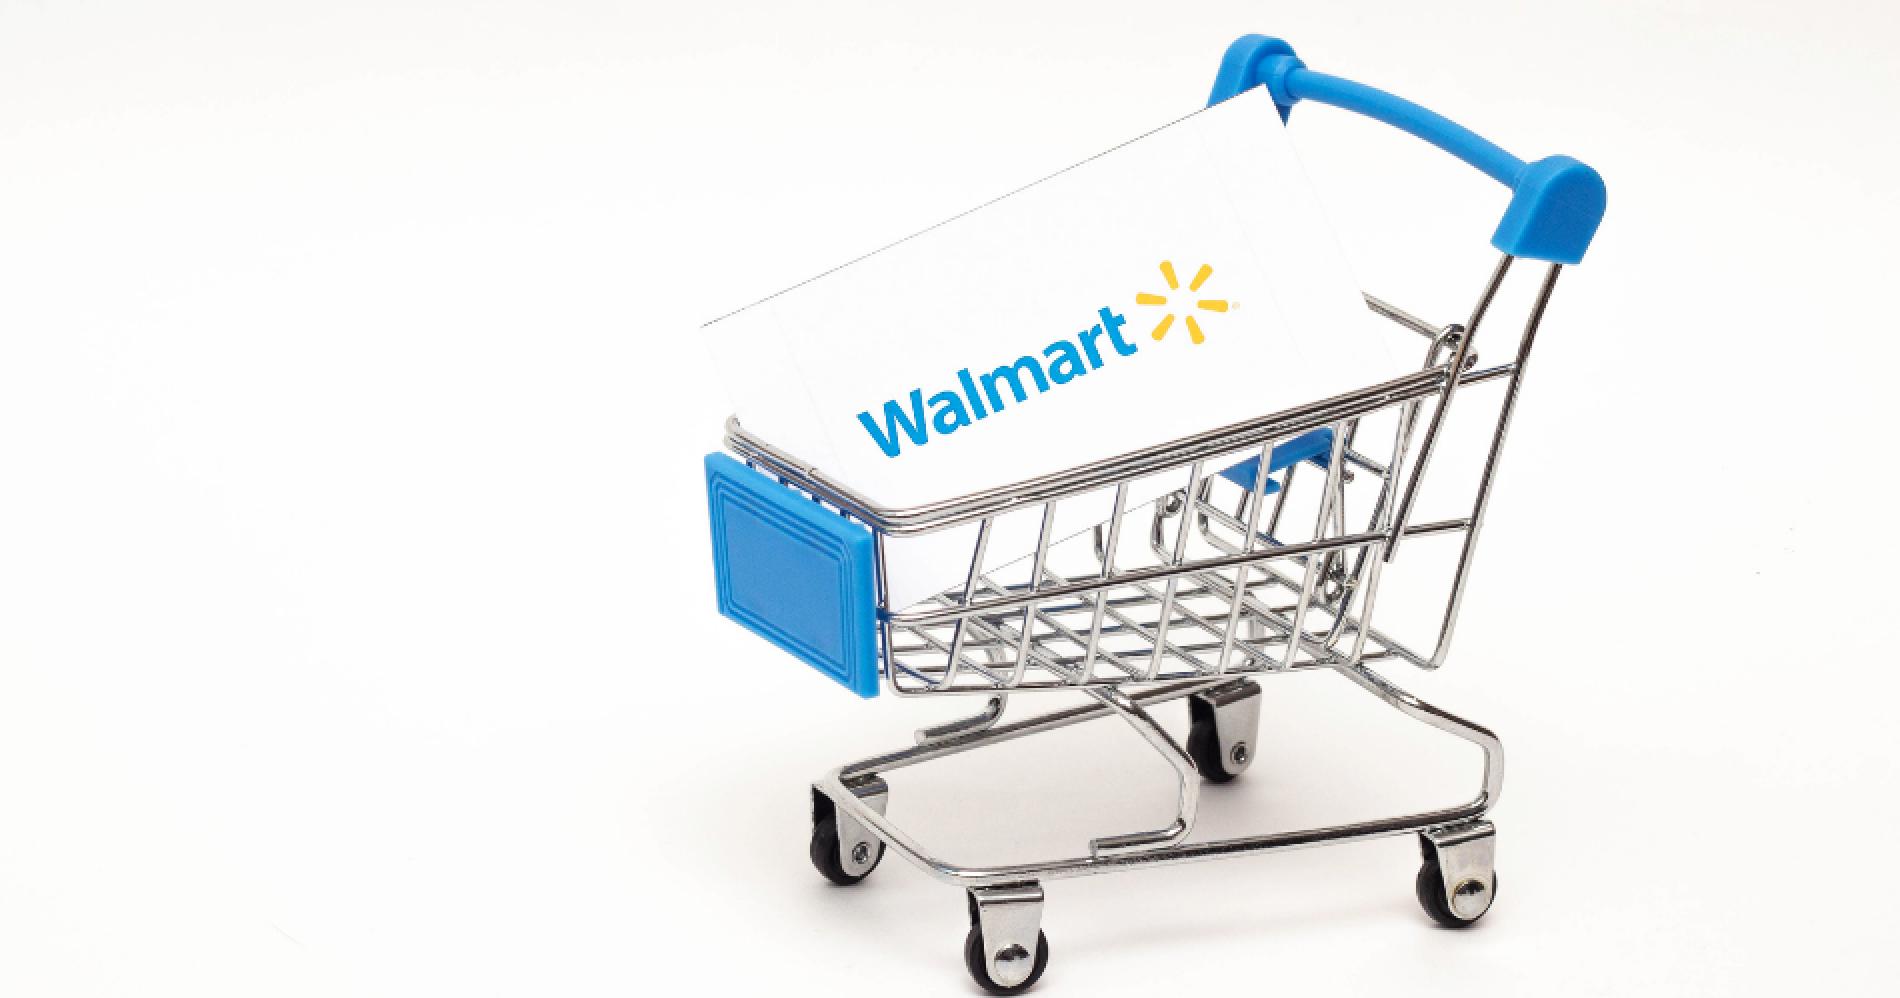 Walmart Illustration Web Bisnis Muda - Canva